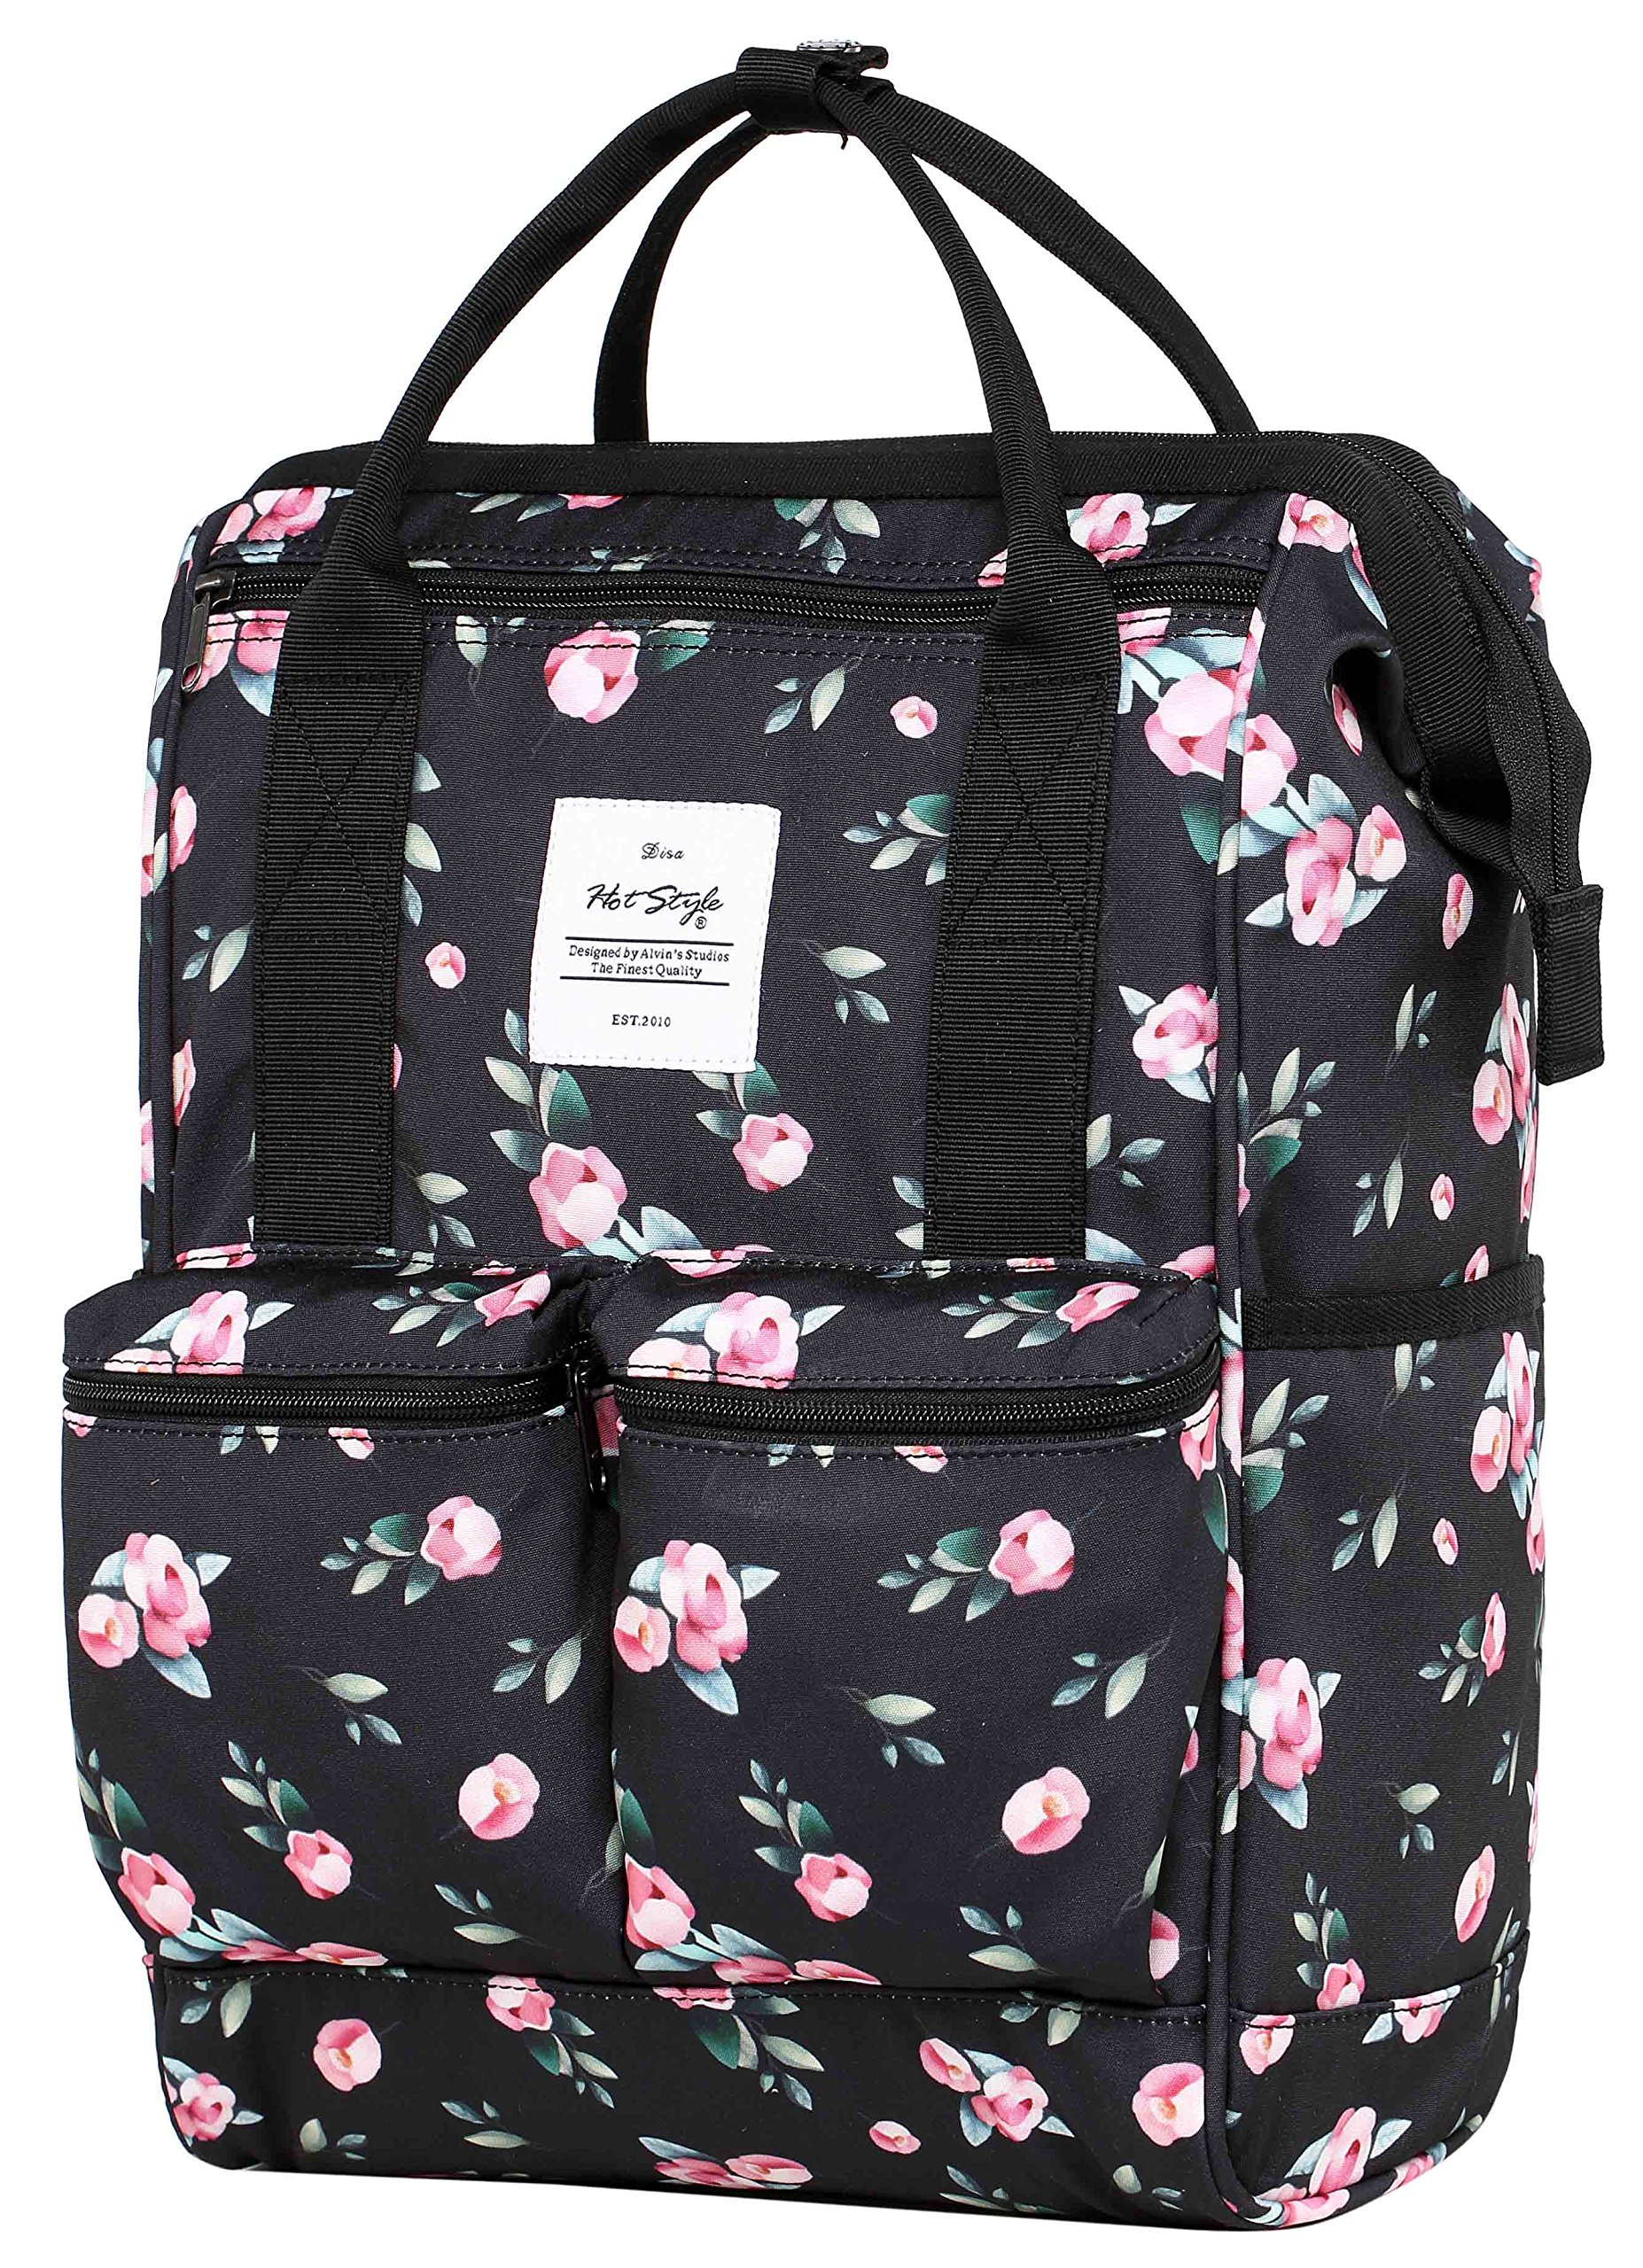 DISA Convertible Backpack Diaper Bag | 17.3''x10.6''x6.7'' | Fits 14-inch Laptop | Rose Black